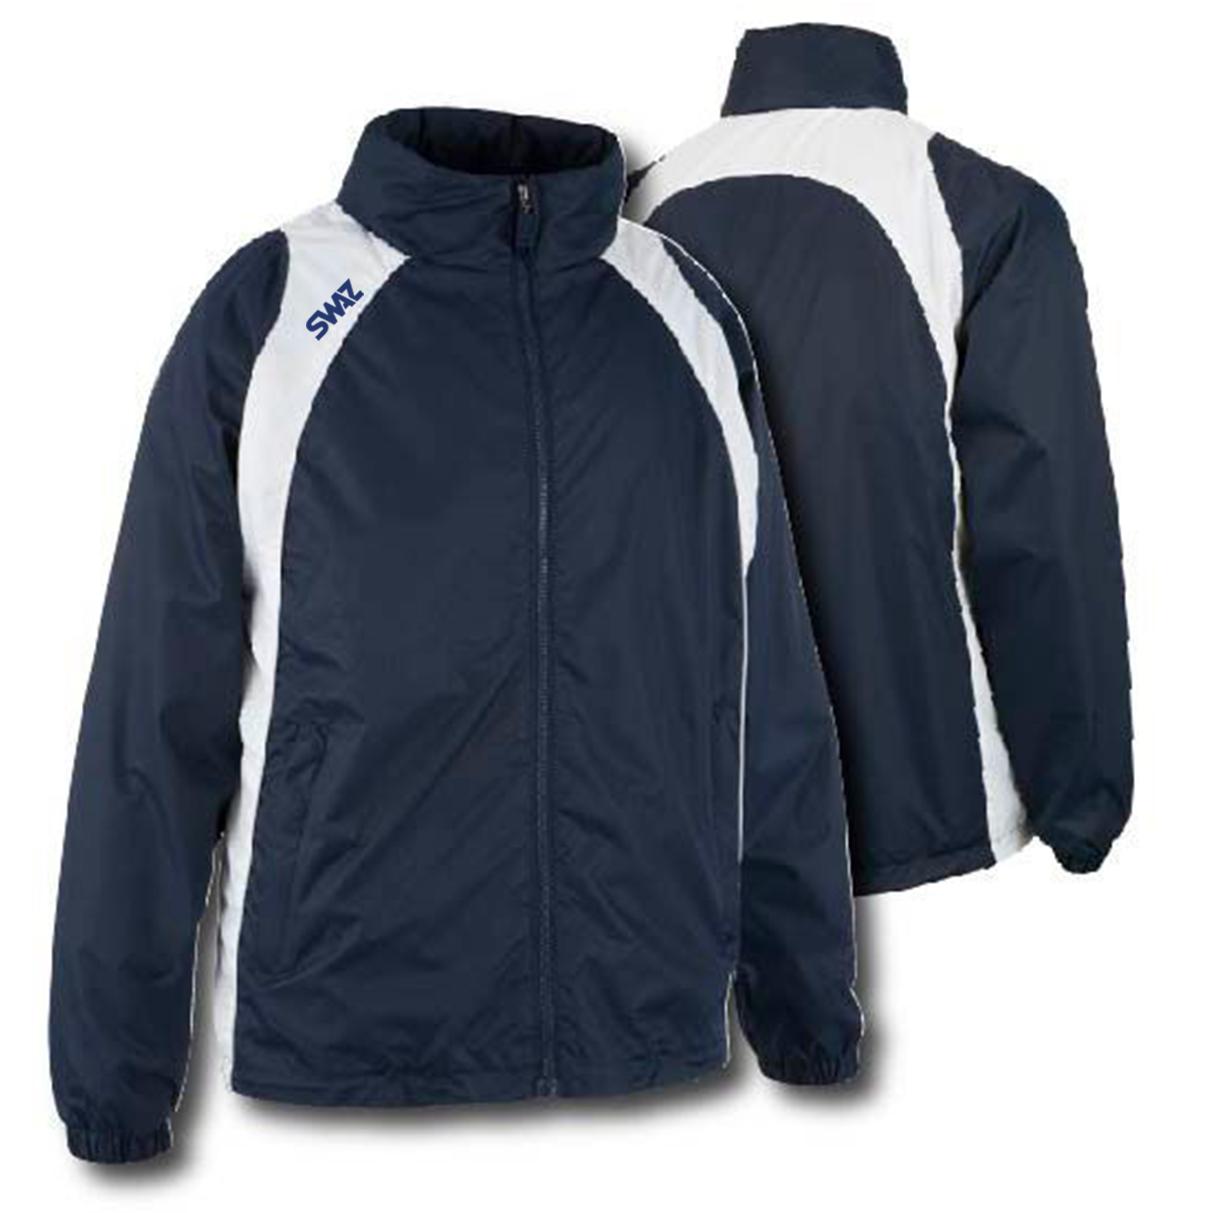 15 SWAZ Showerproof Jackets – Navy/White